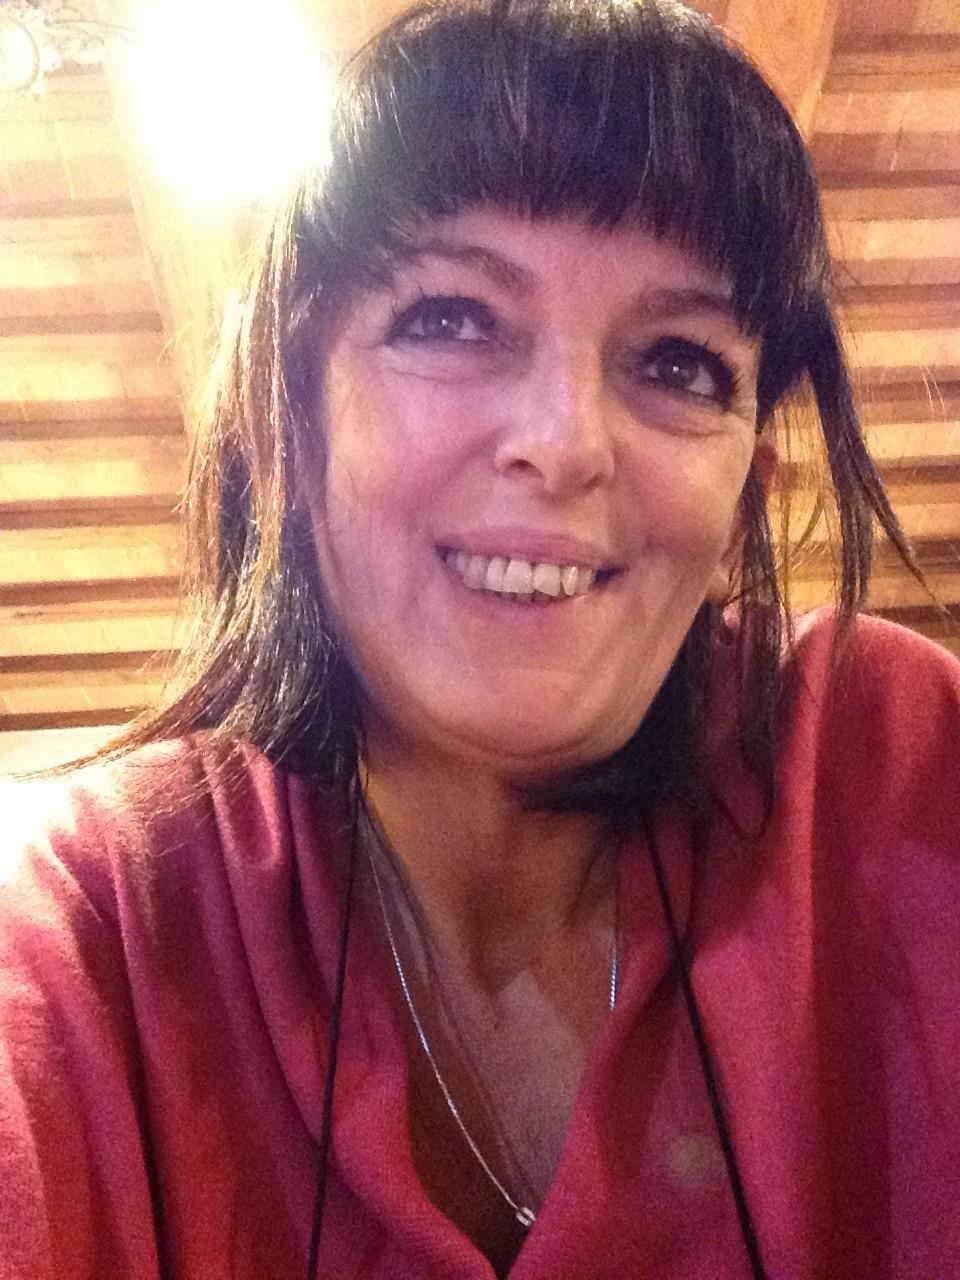 Valentina from Orvieto